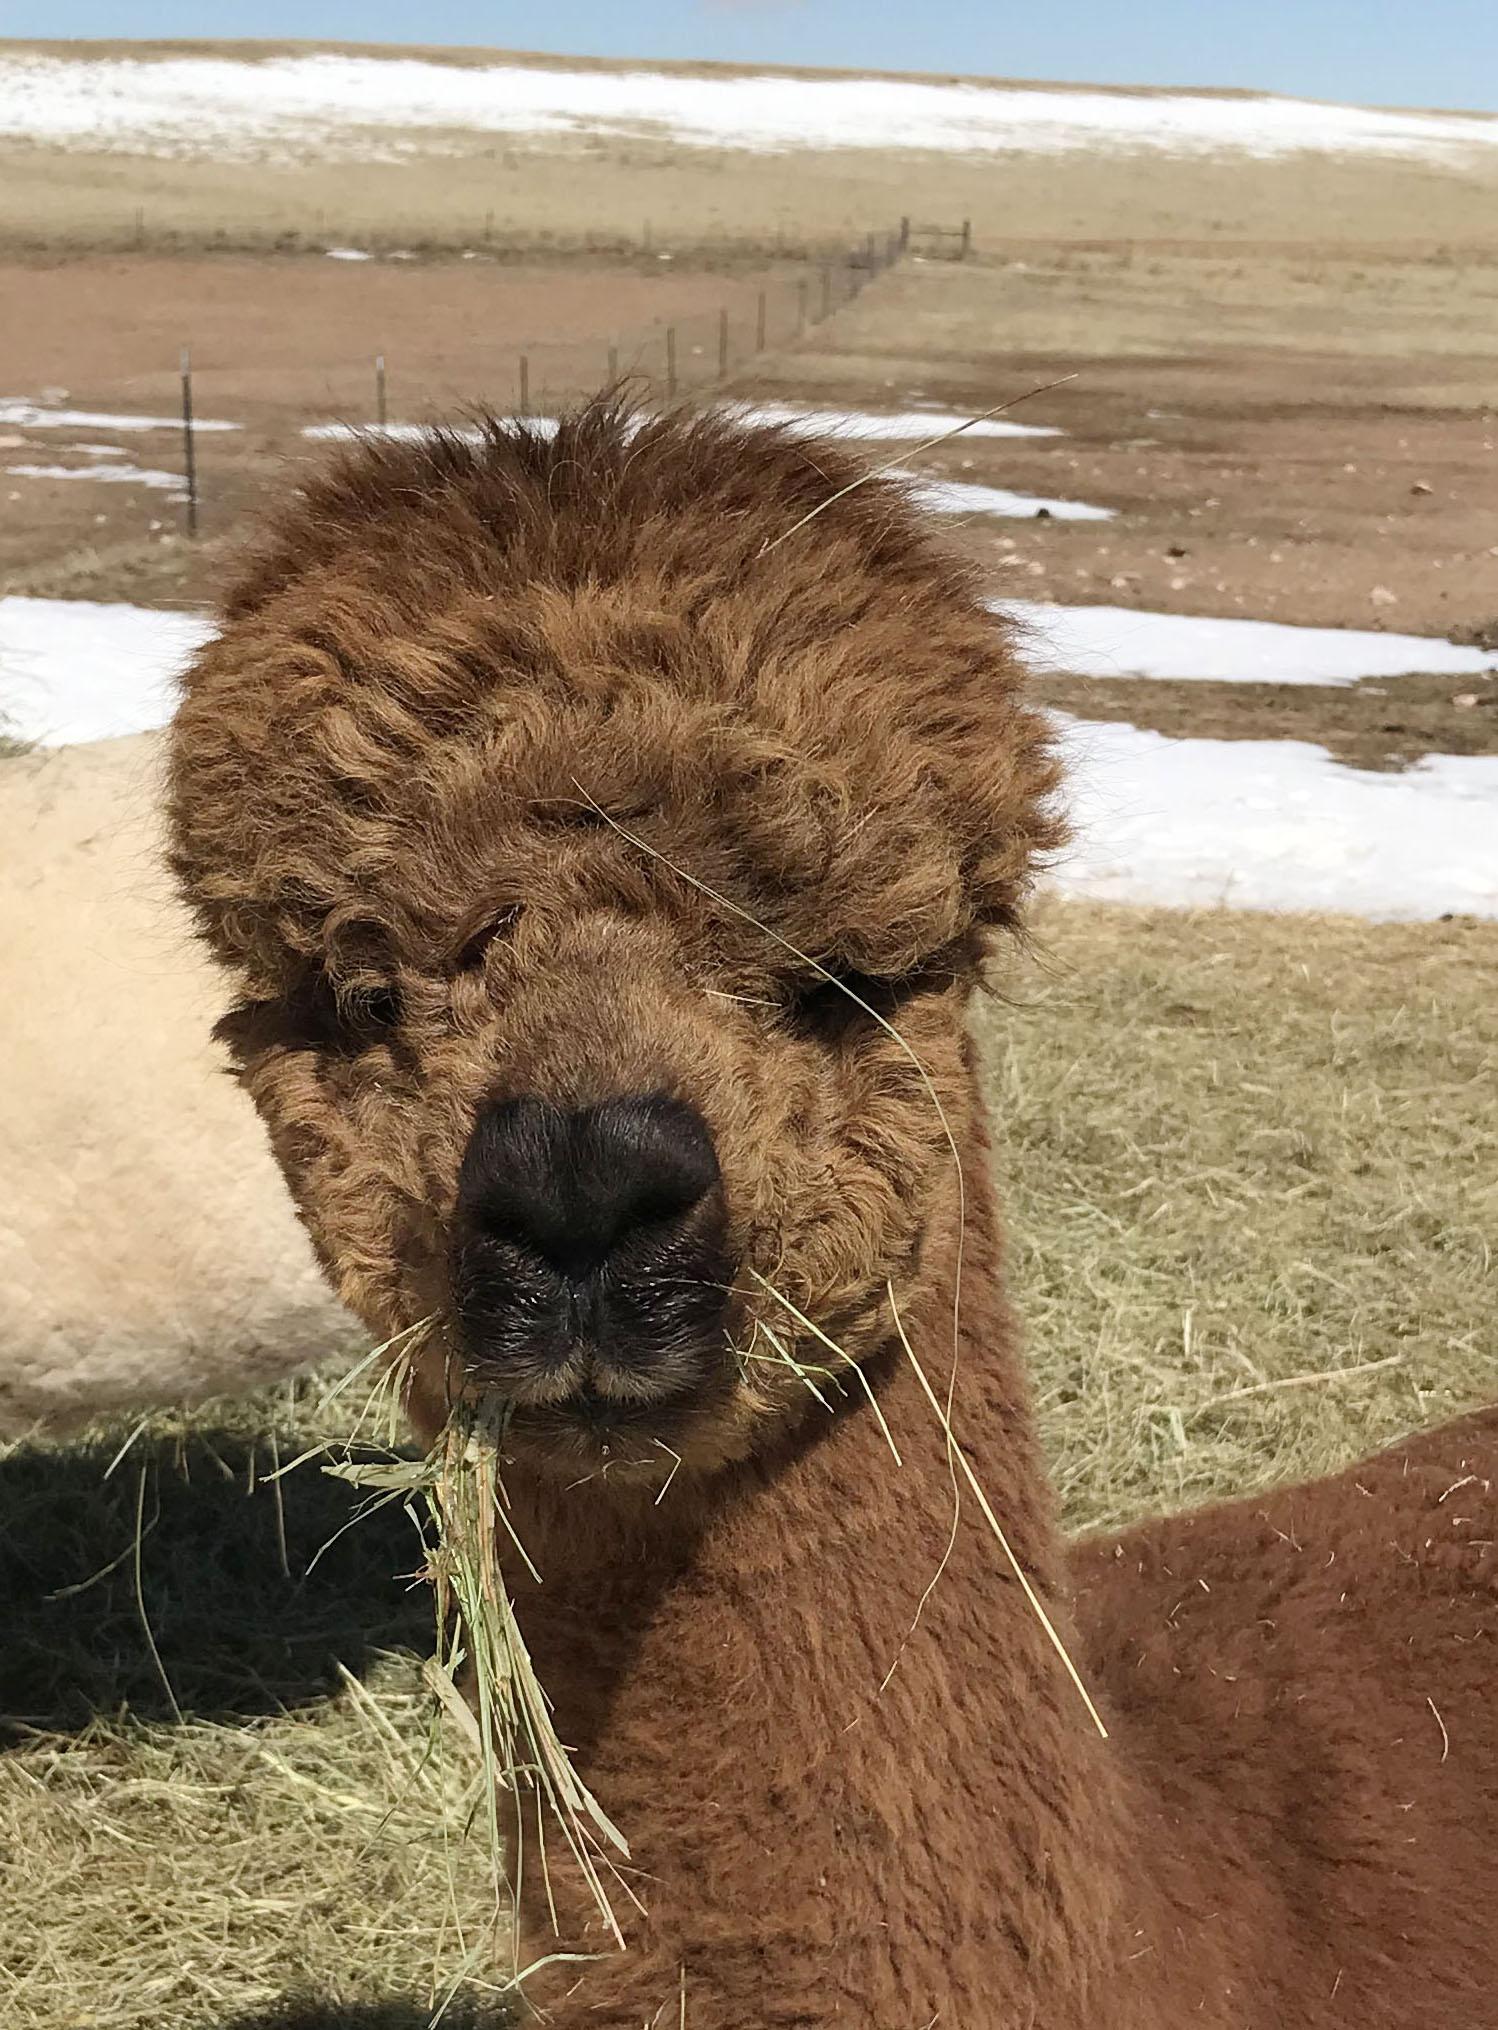 Toby the alpaca close up